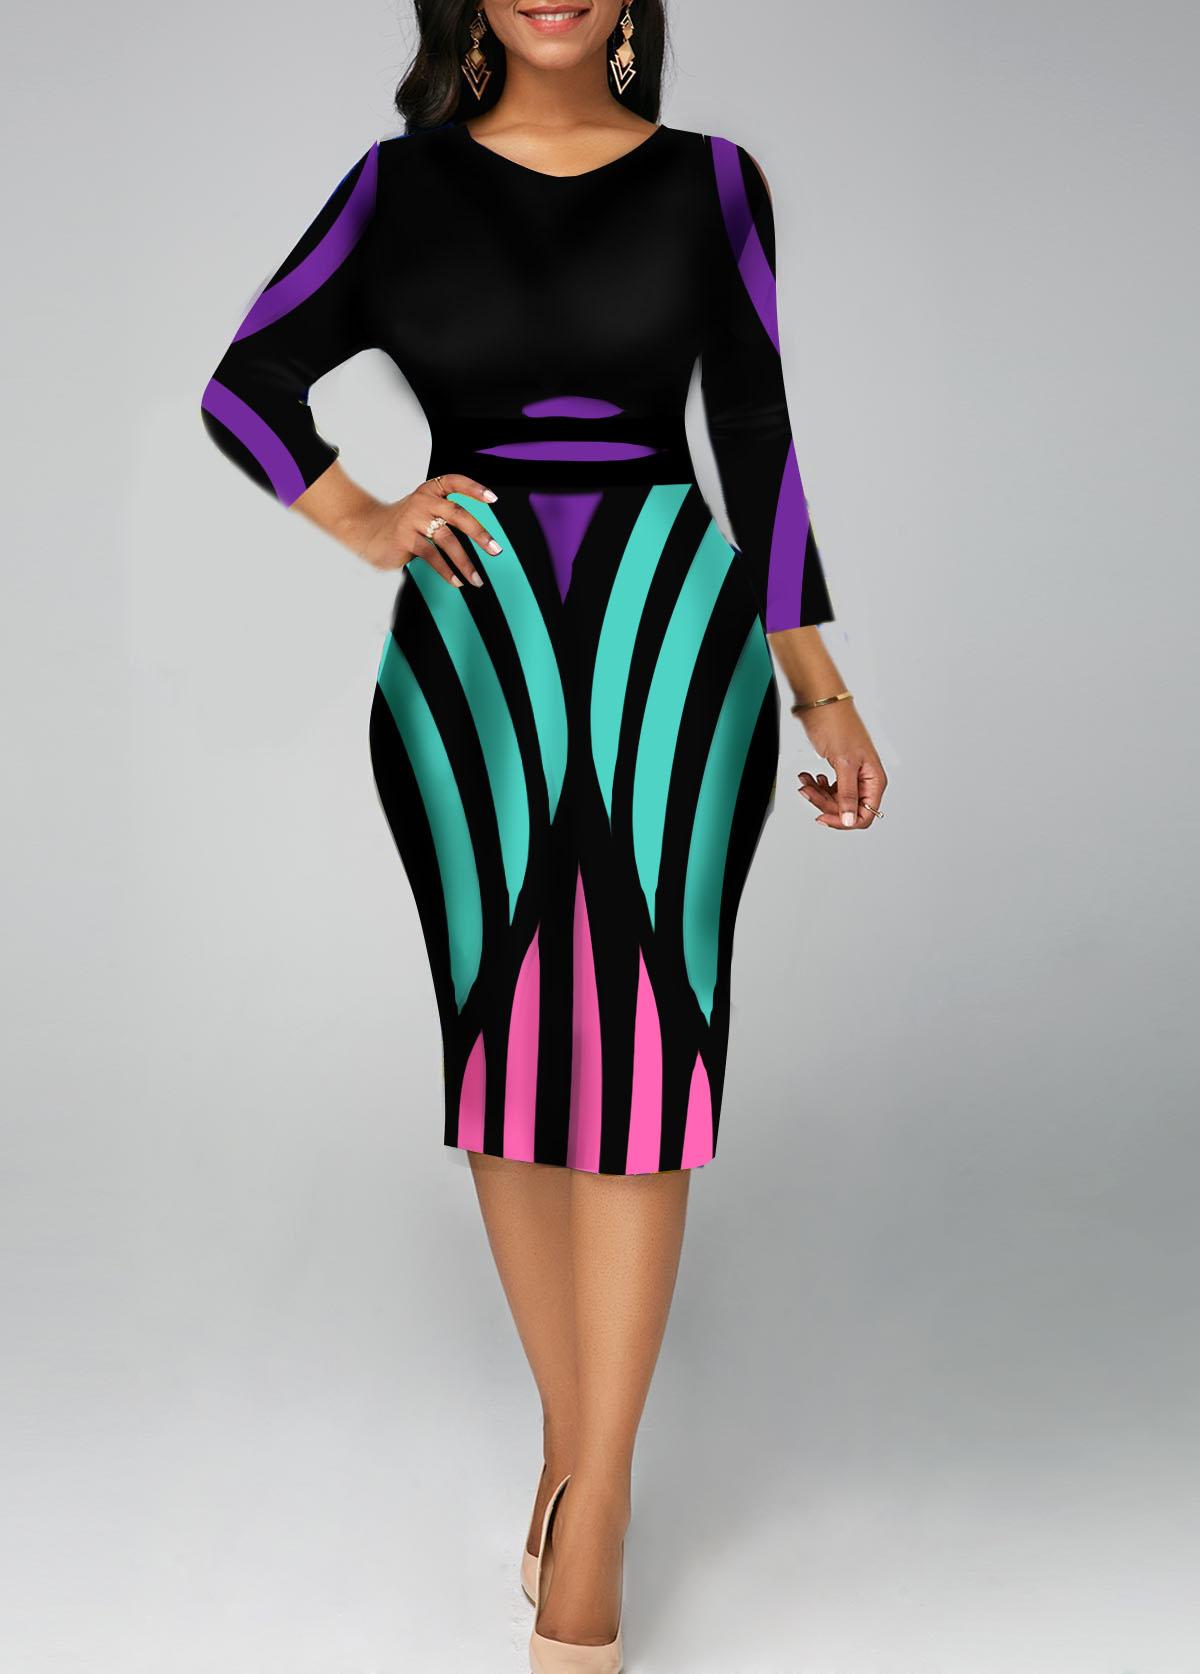 Stripe Print Three Quarter Sleeve V Neck Sheath Dress